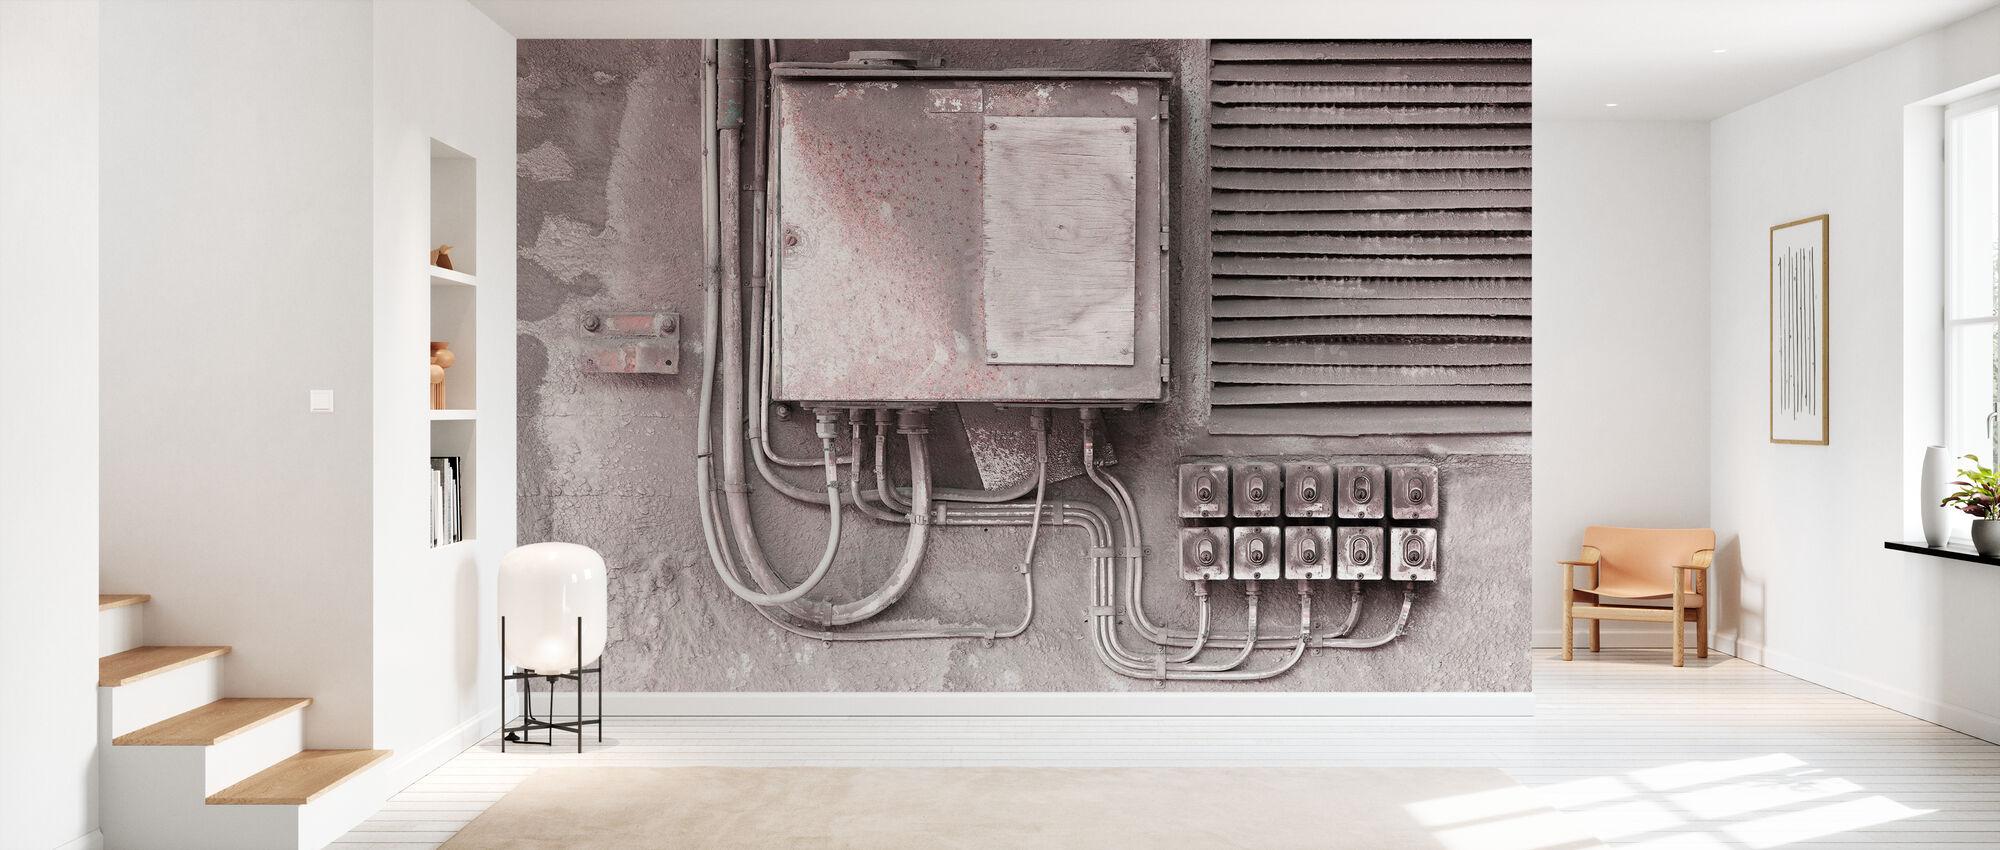 Old Technology - Wallpaper - Hallway